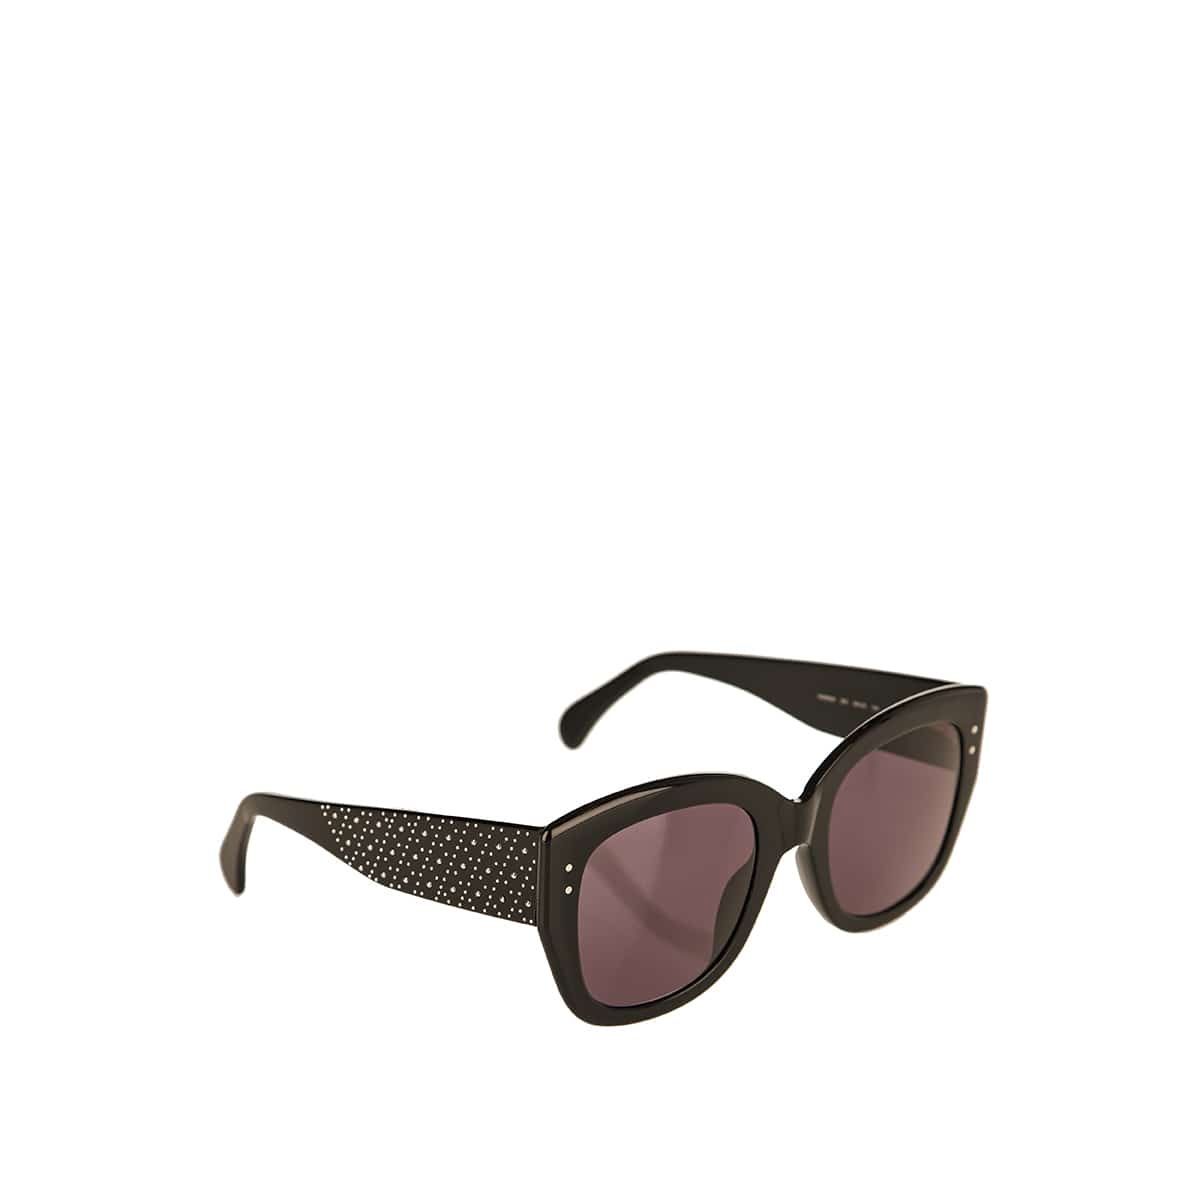 Oversized studded sunglasses